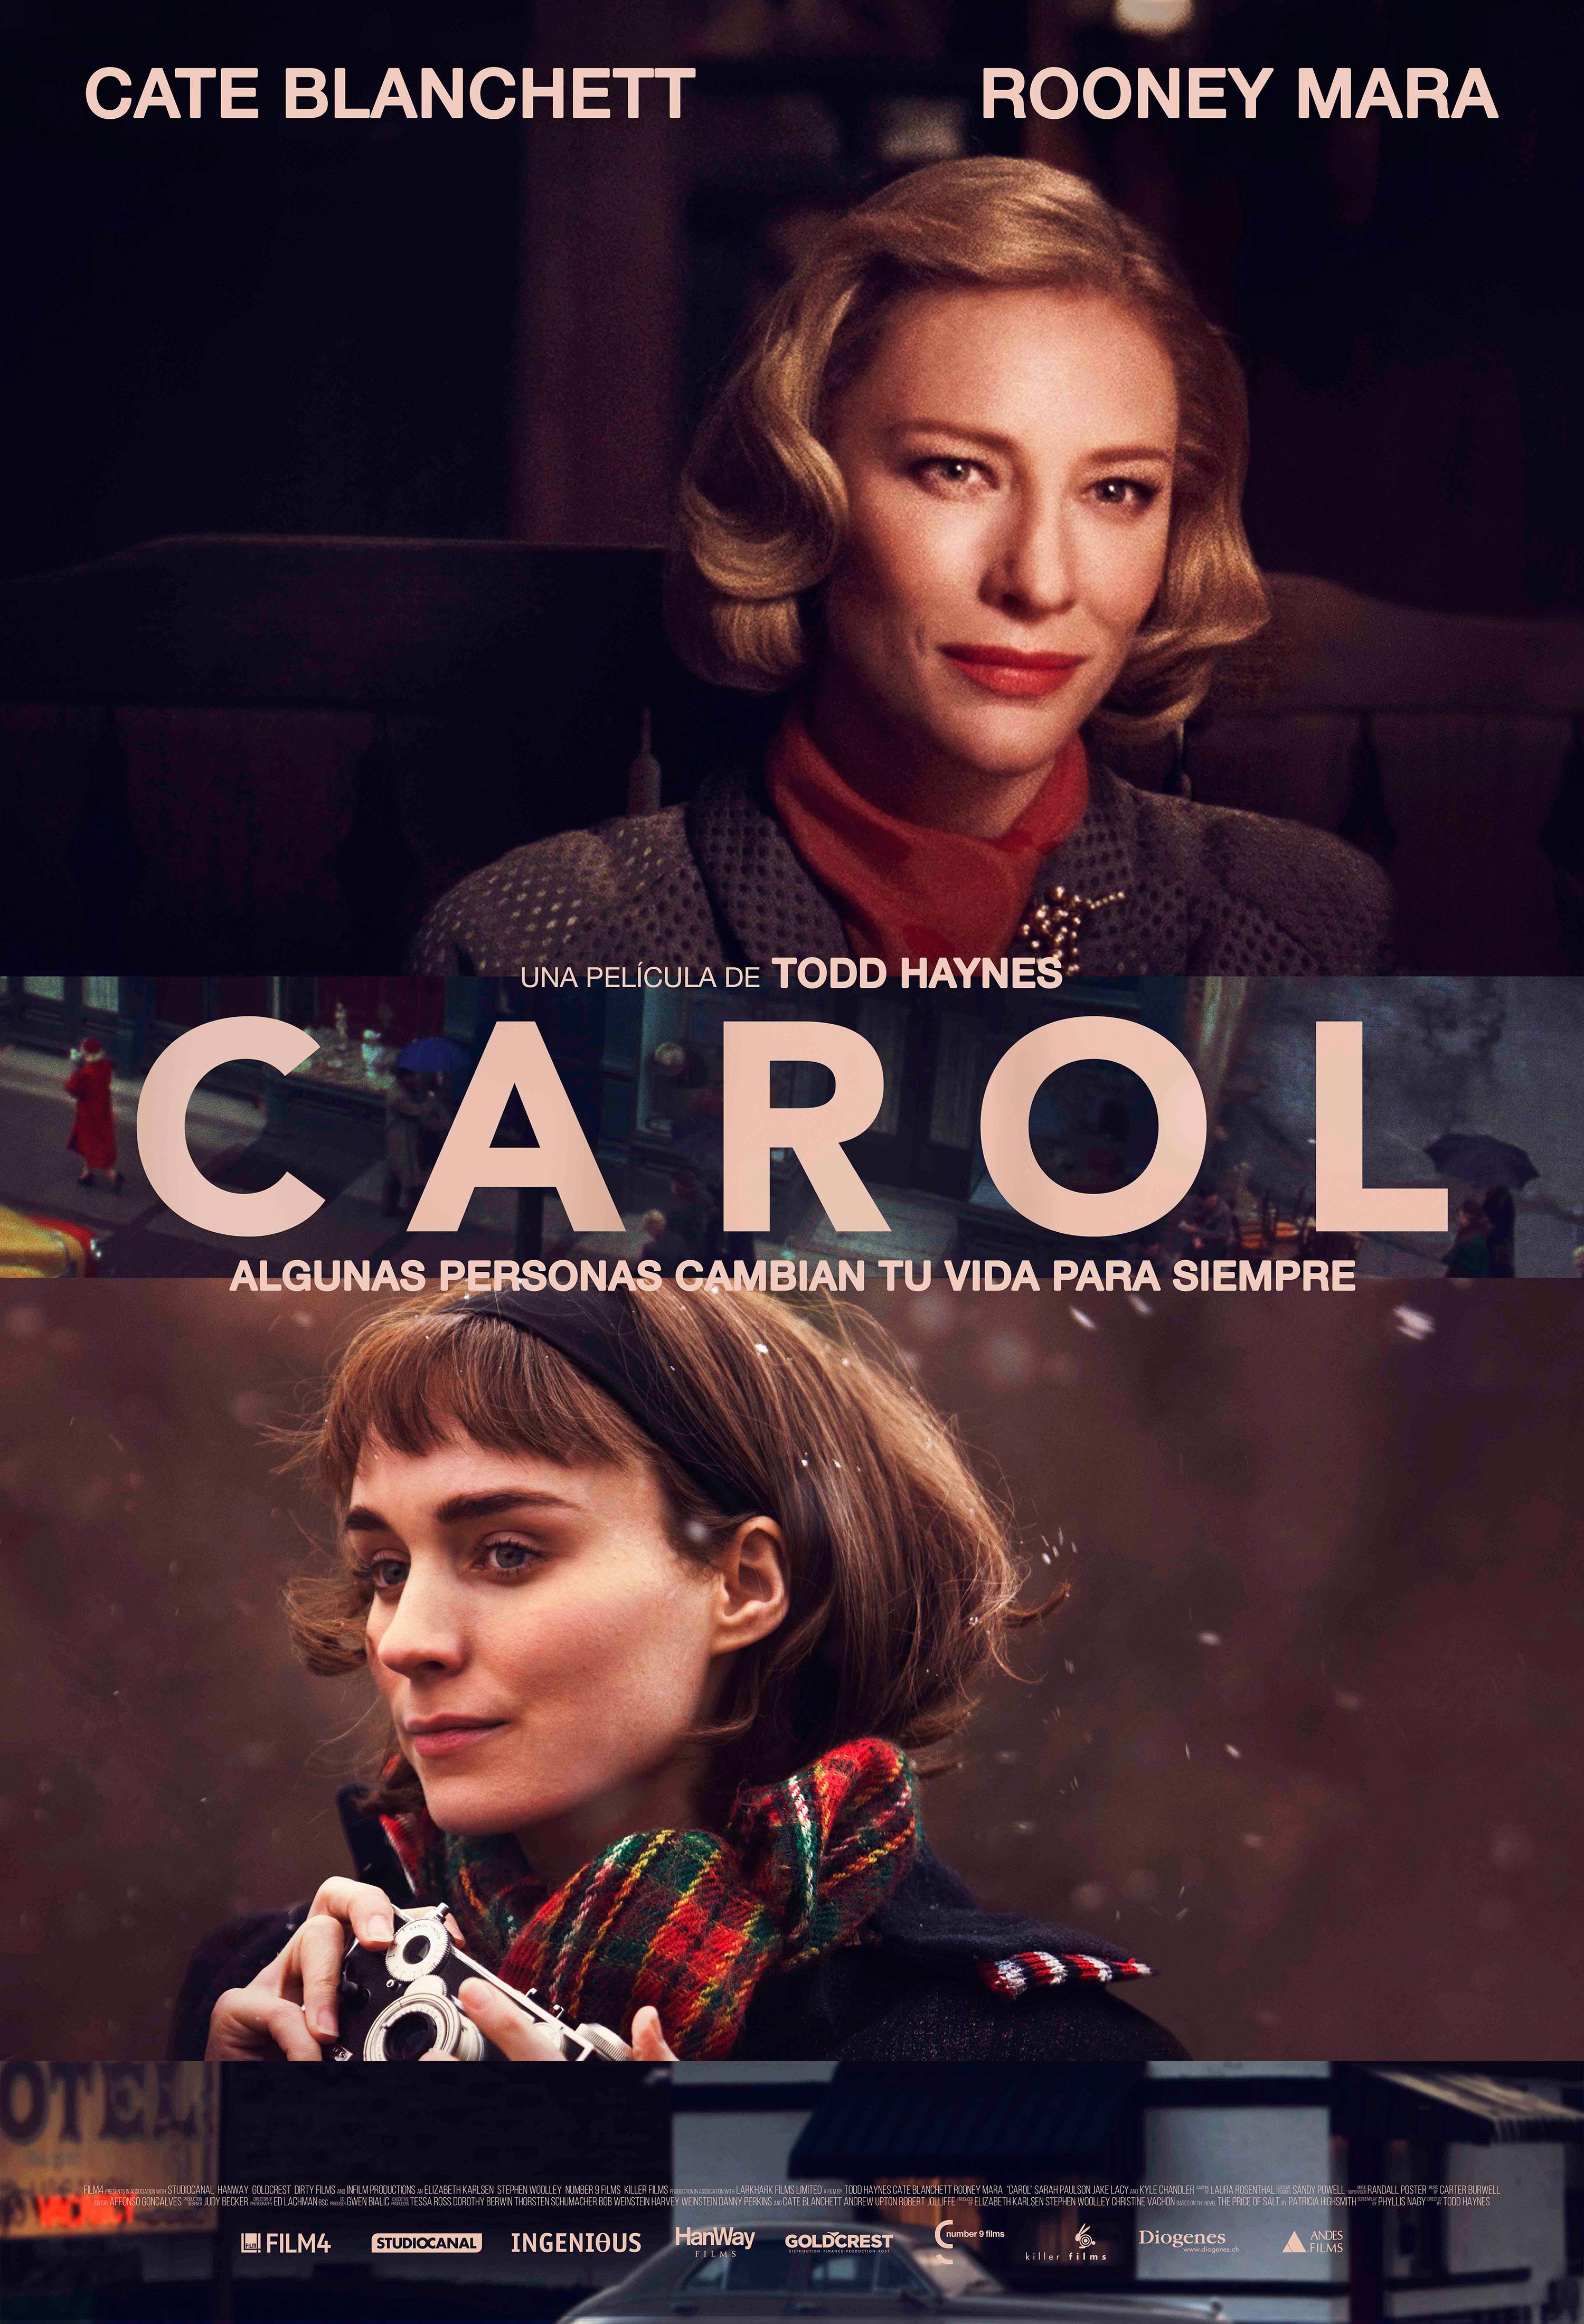 https://www.andesfilms.com.pe/carol-2016/